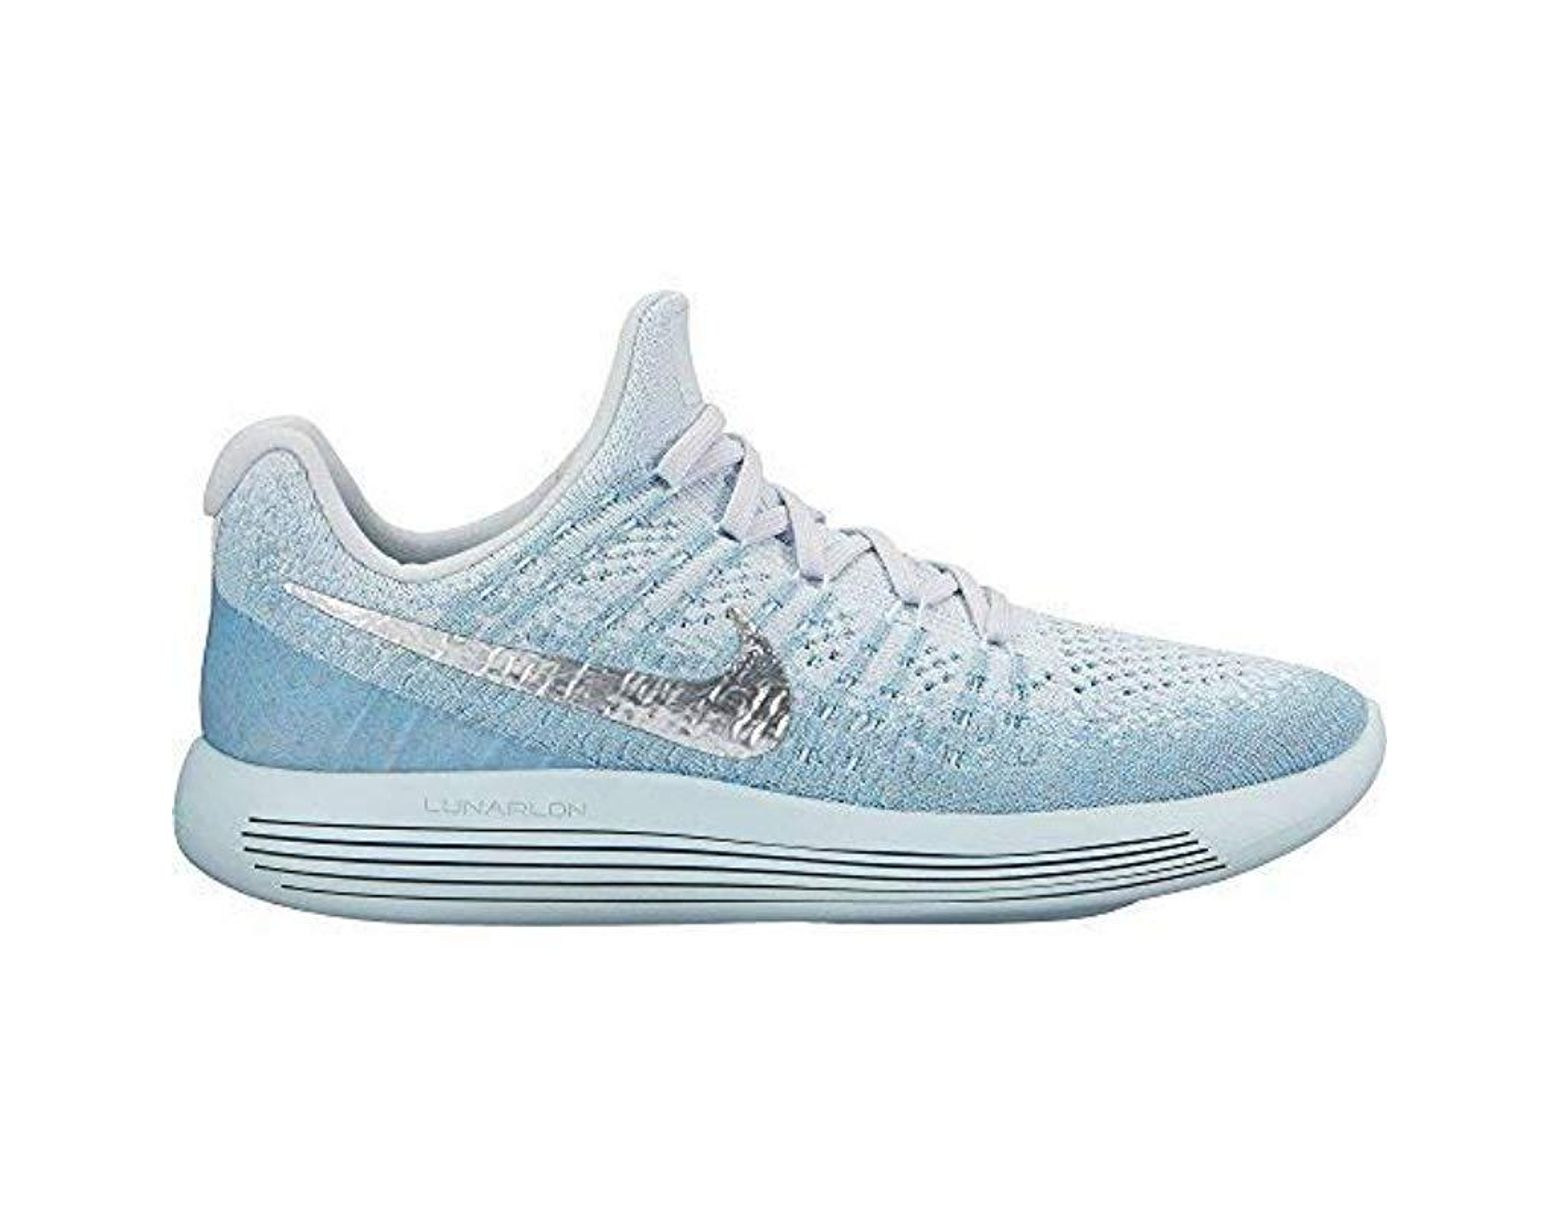 quality design a4705 5a49e Women's Blue Lunarepic Low Flyknit 2 Training Shoes